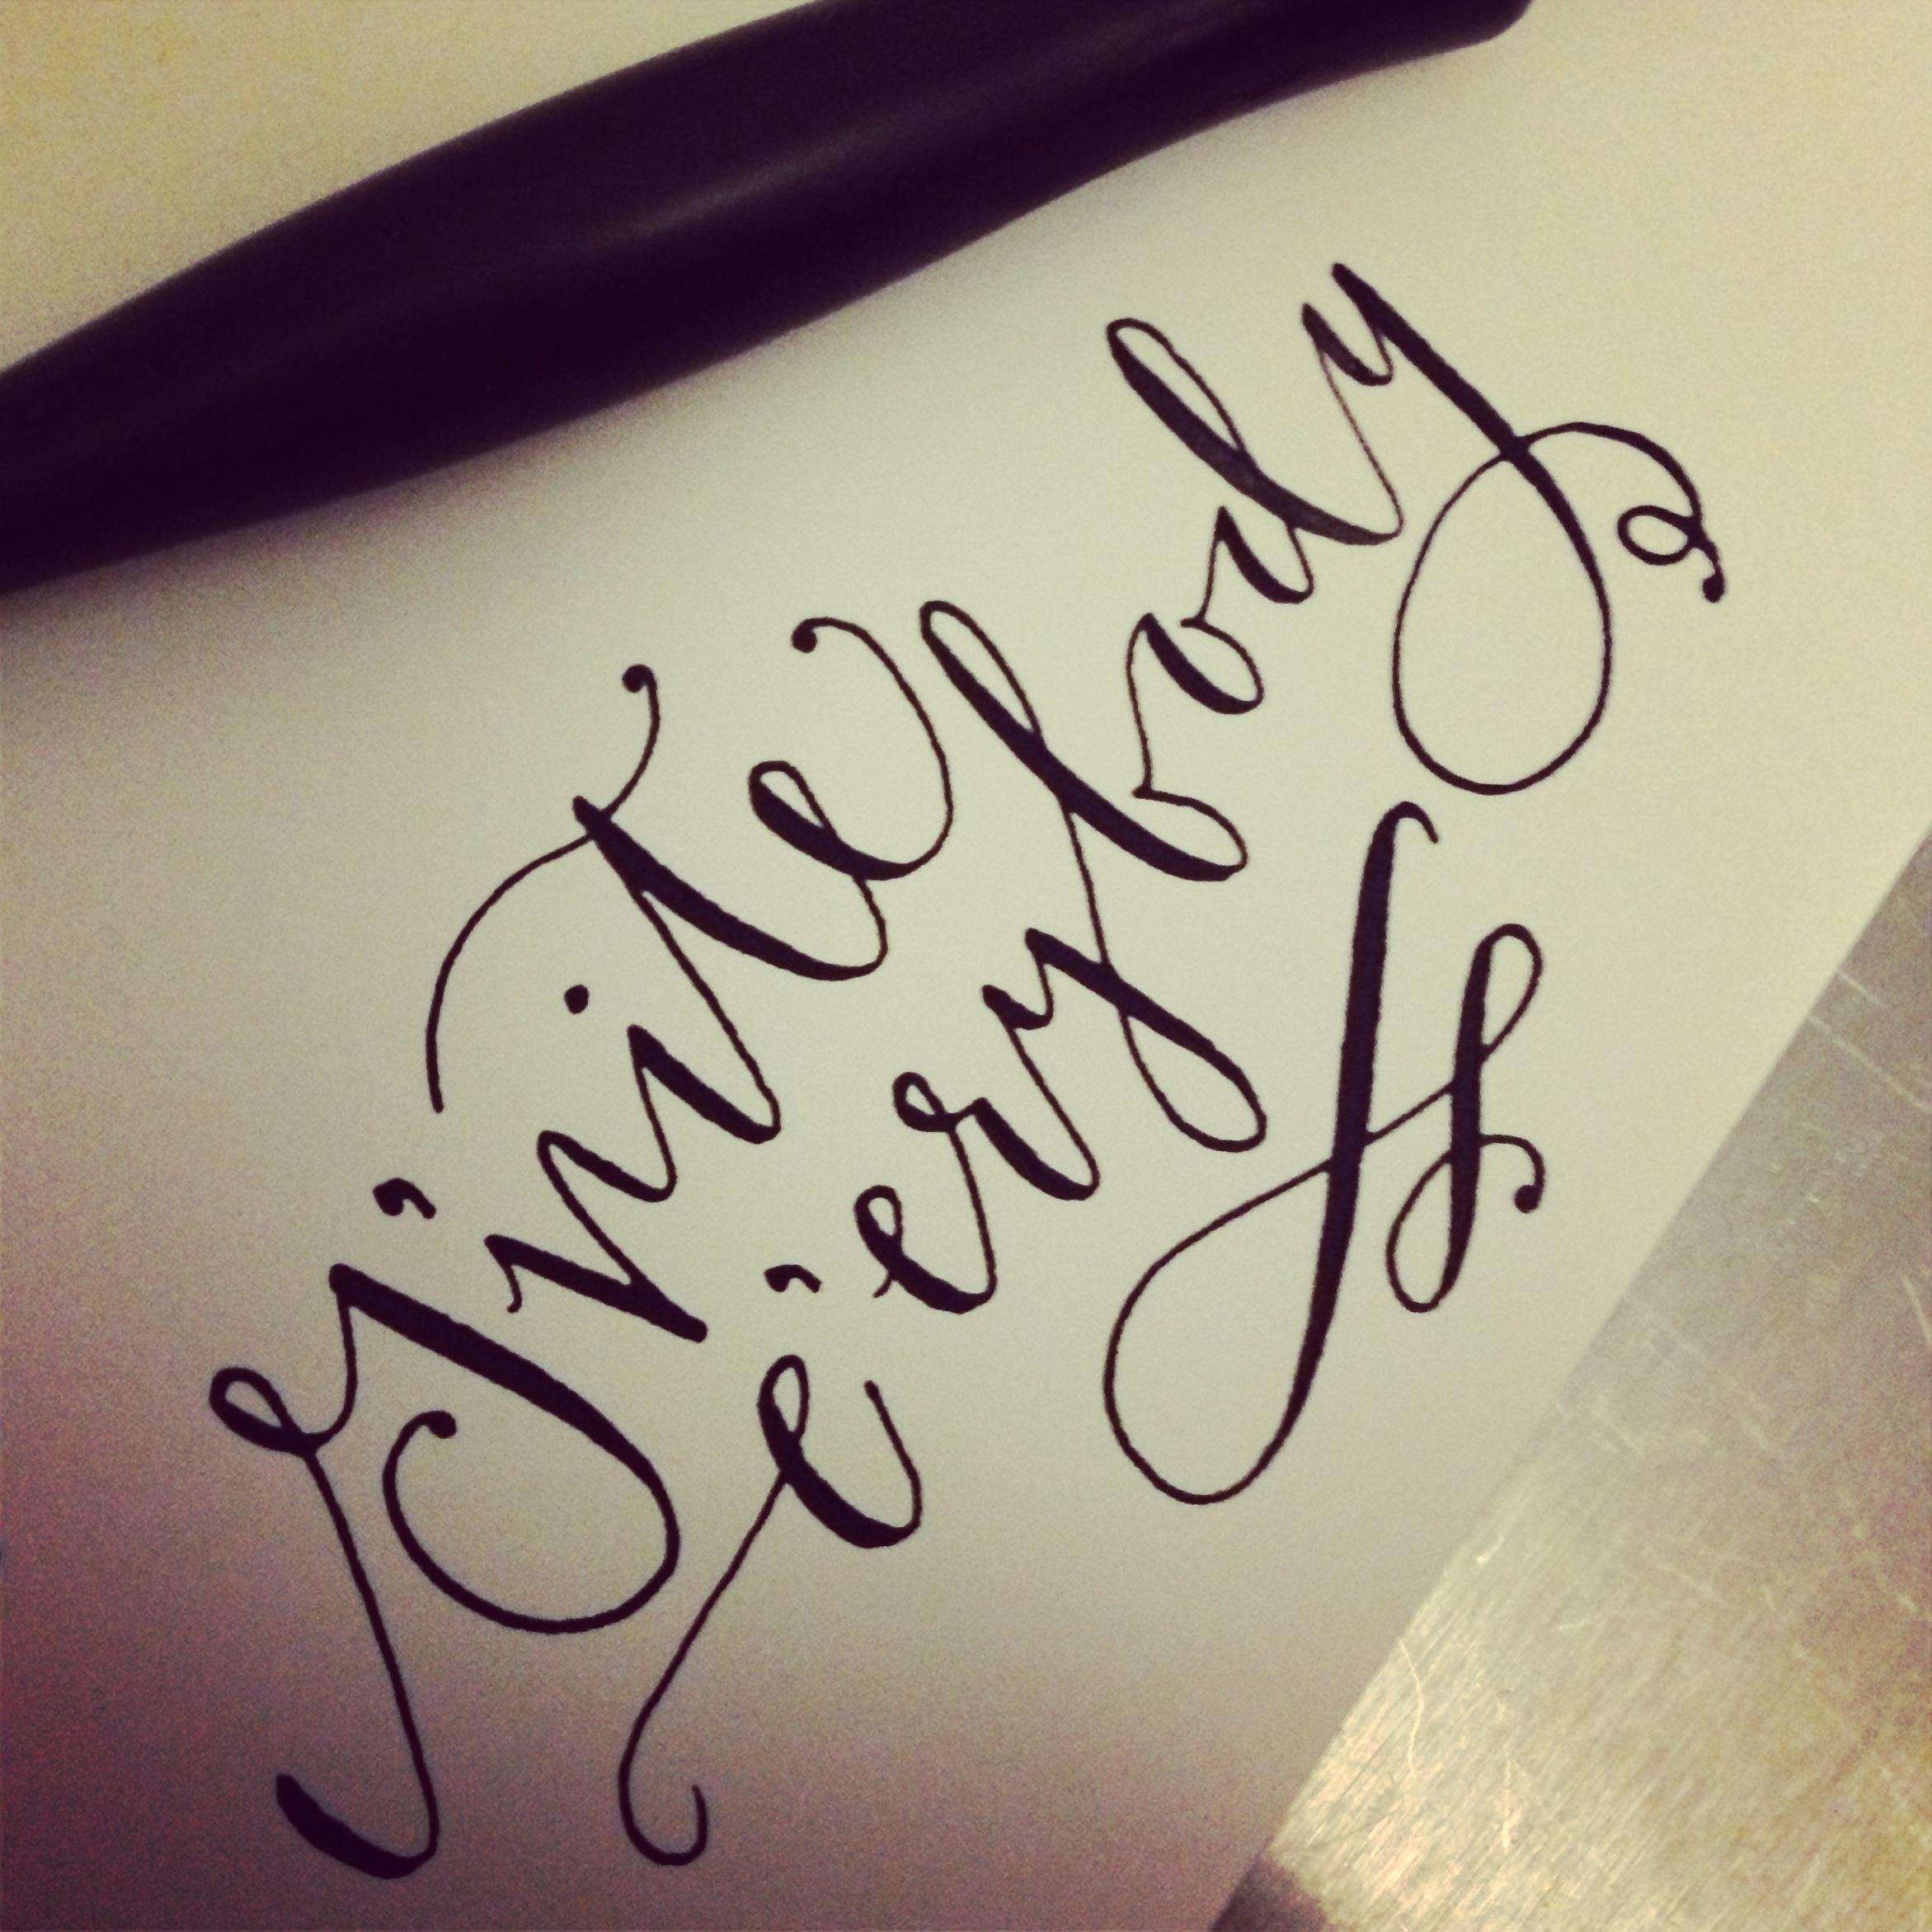 Gnite e'erybody calligraphy